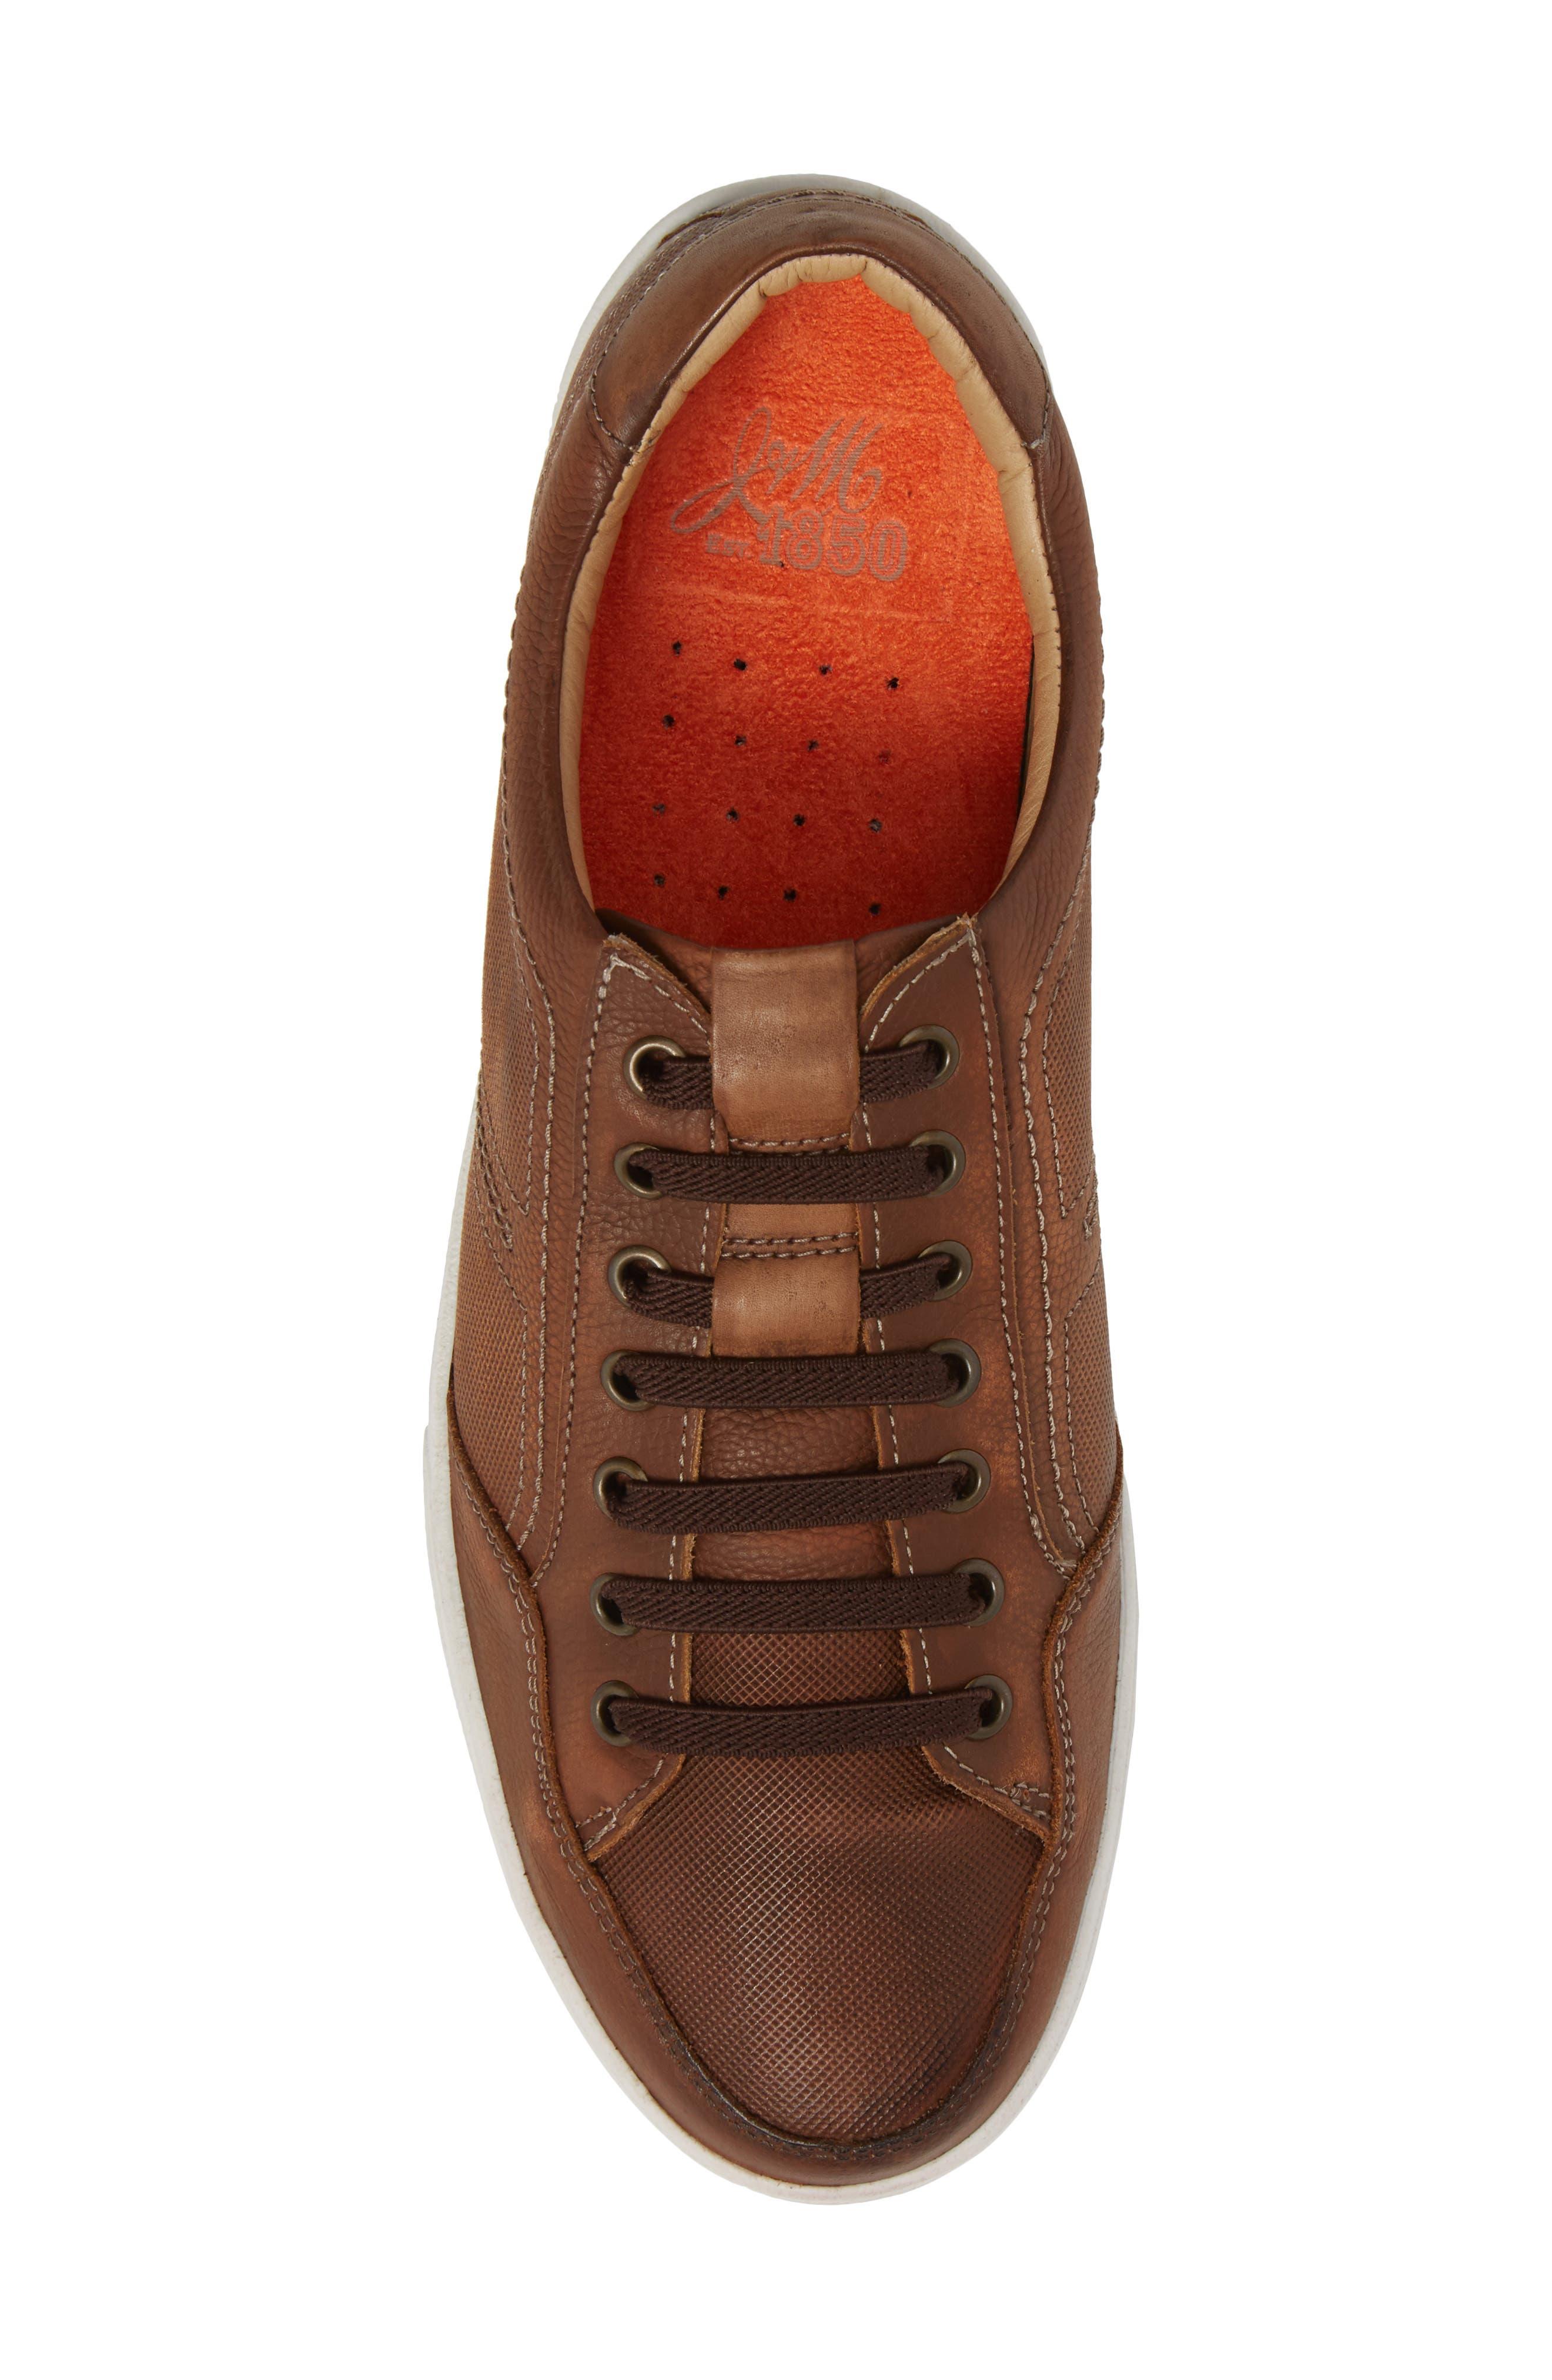 Quinton Textured Low Top Sneaker,                             Alternate thumbnail 5, color,                             Tan Leather